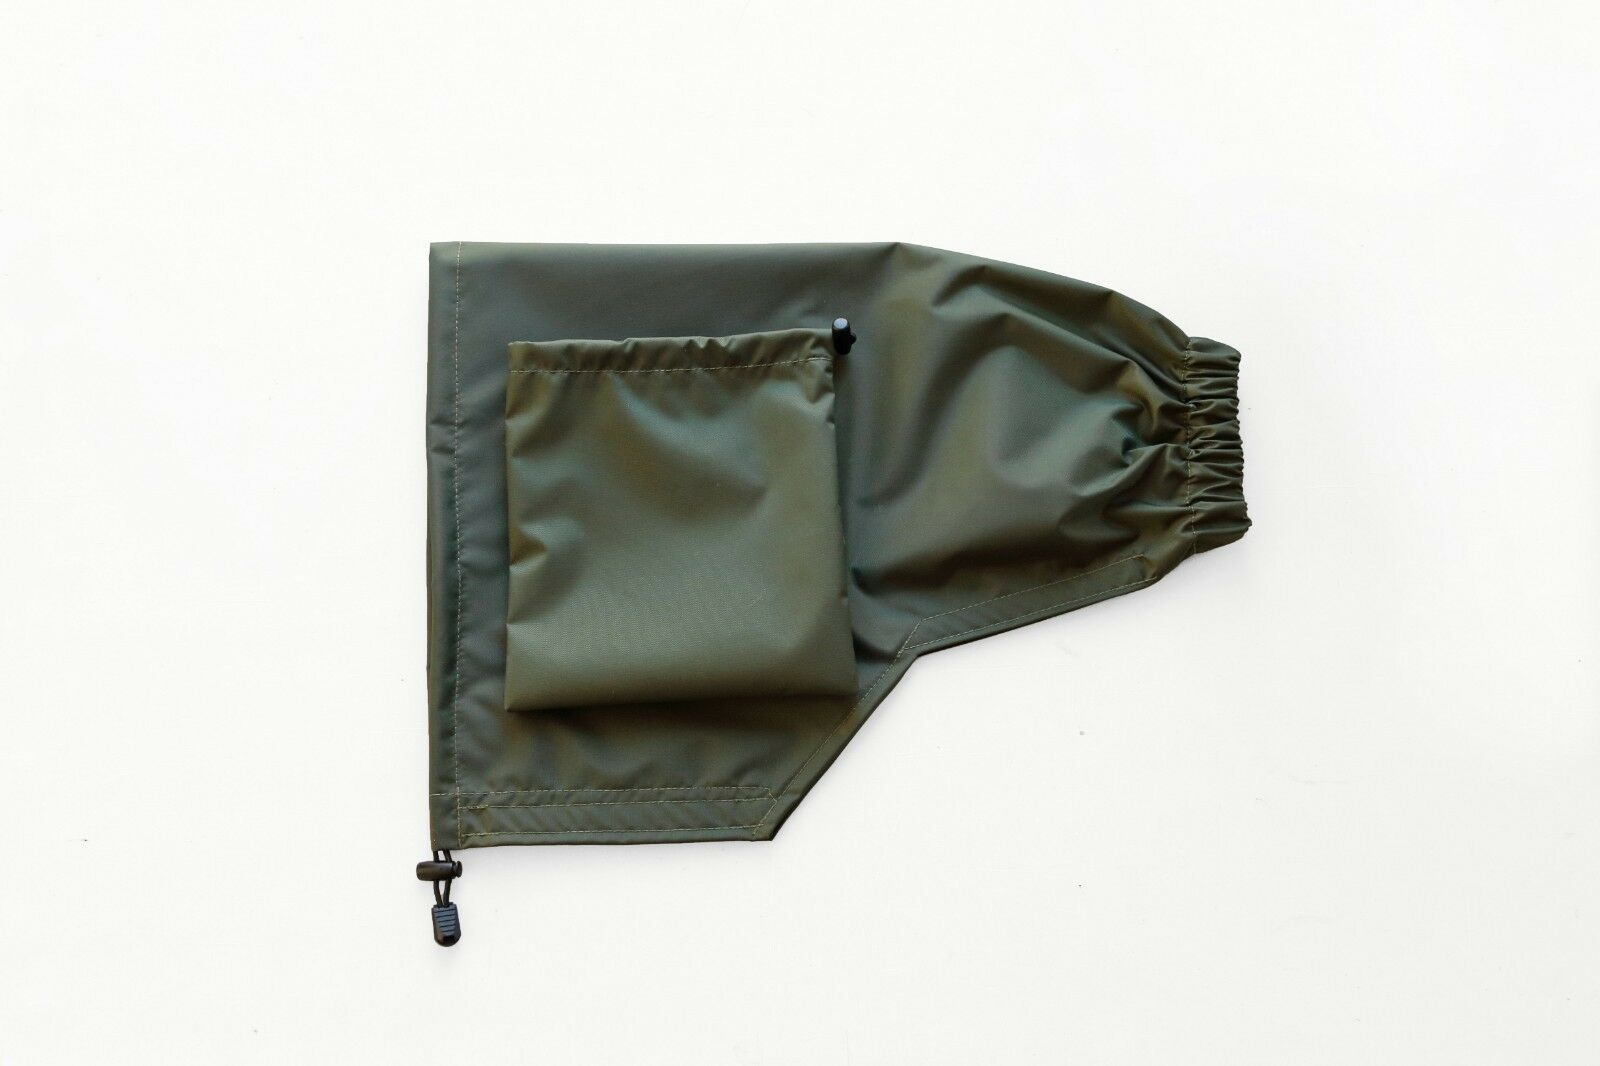 Waterproof Lens & Camera Rain Cover for Olympus M.Zuiko ED 40-150mm F2.8 Pro